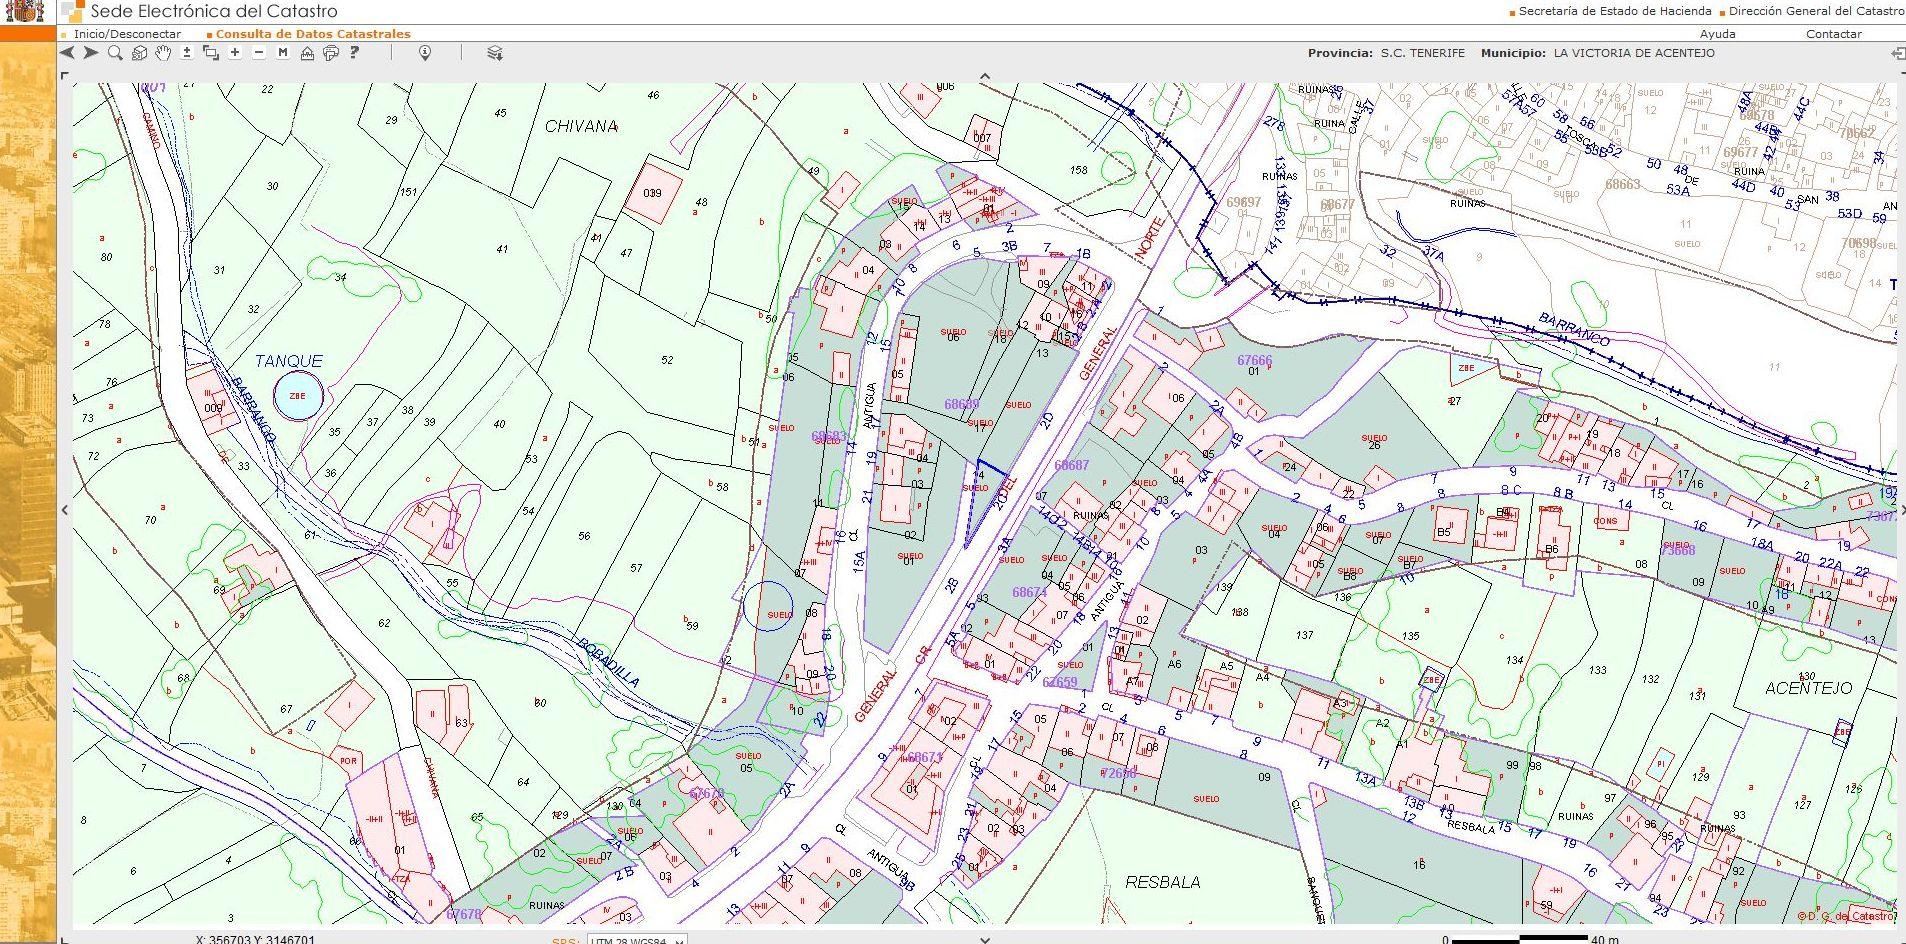 Captura cartografia catastal de la Victoria de Acentejo